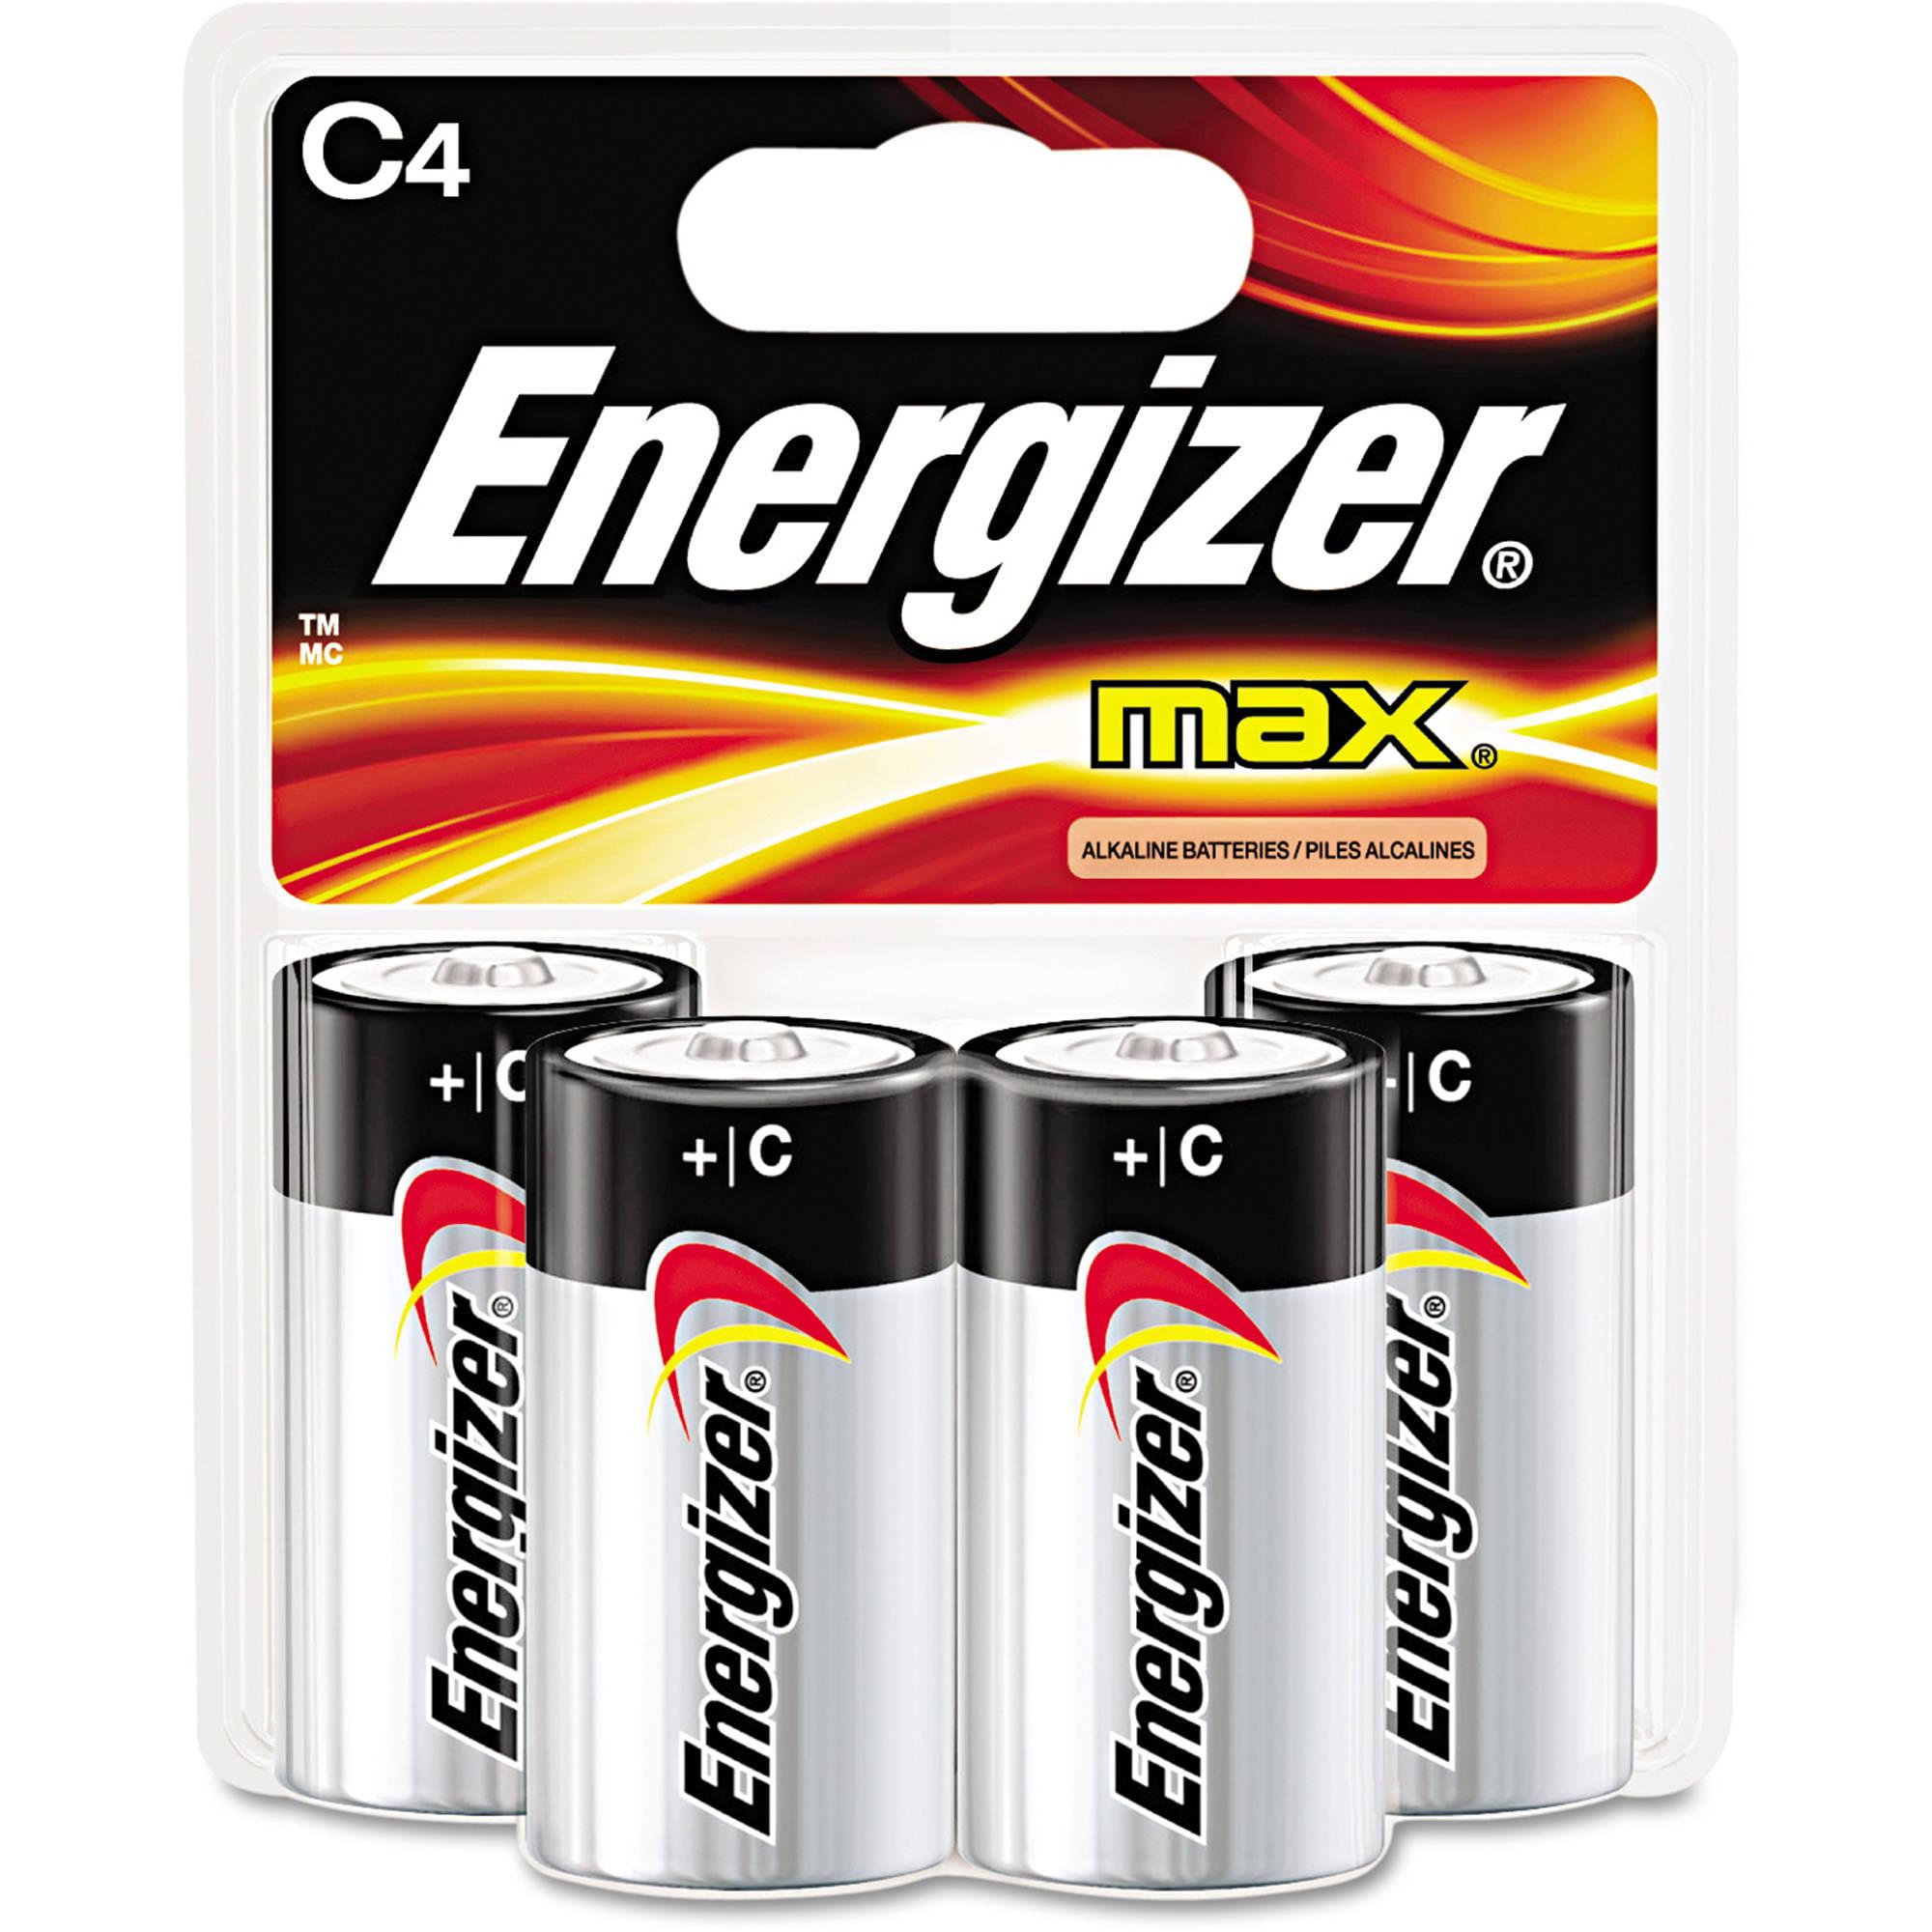 Energizer Max Alkaline Batteries C, 4 Pack